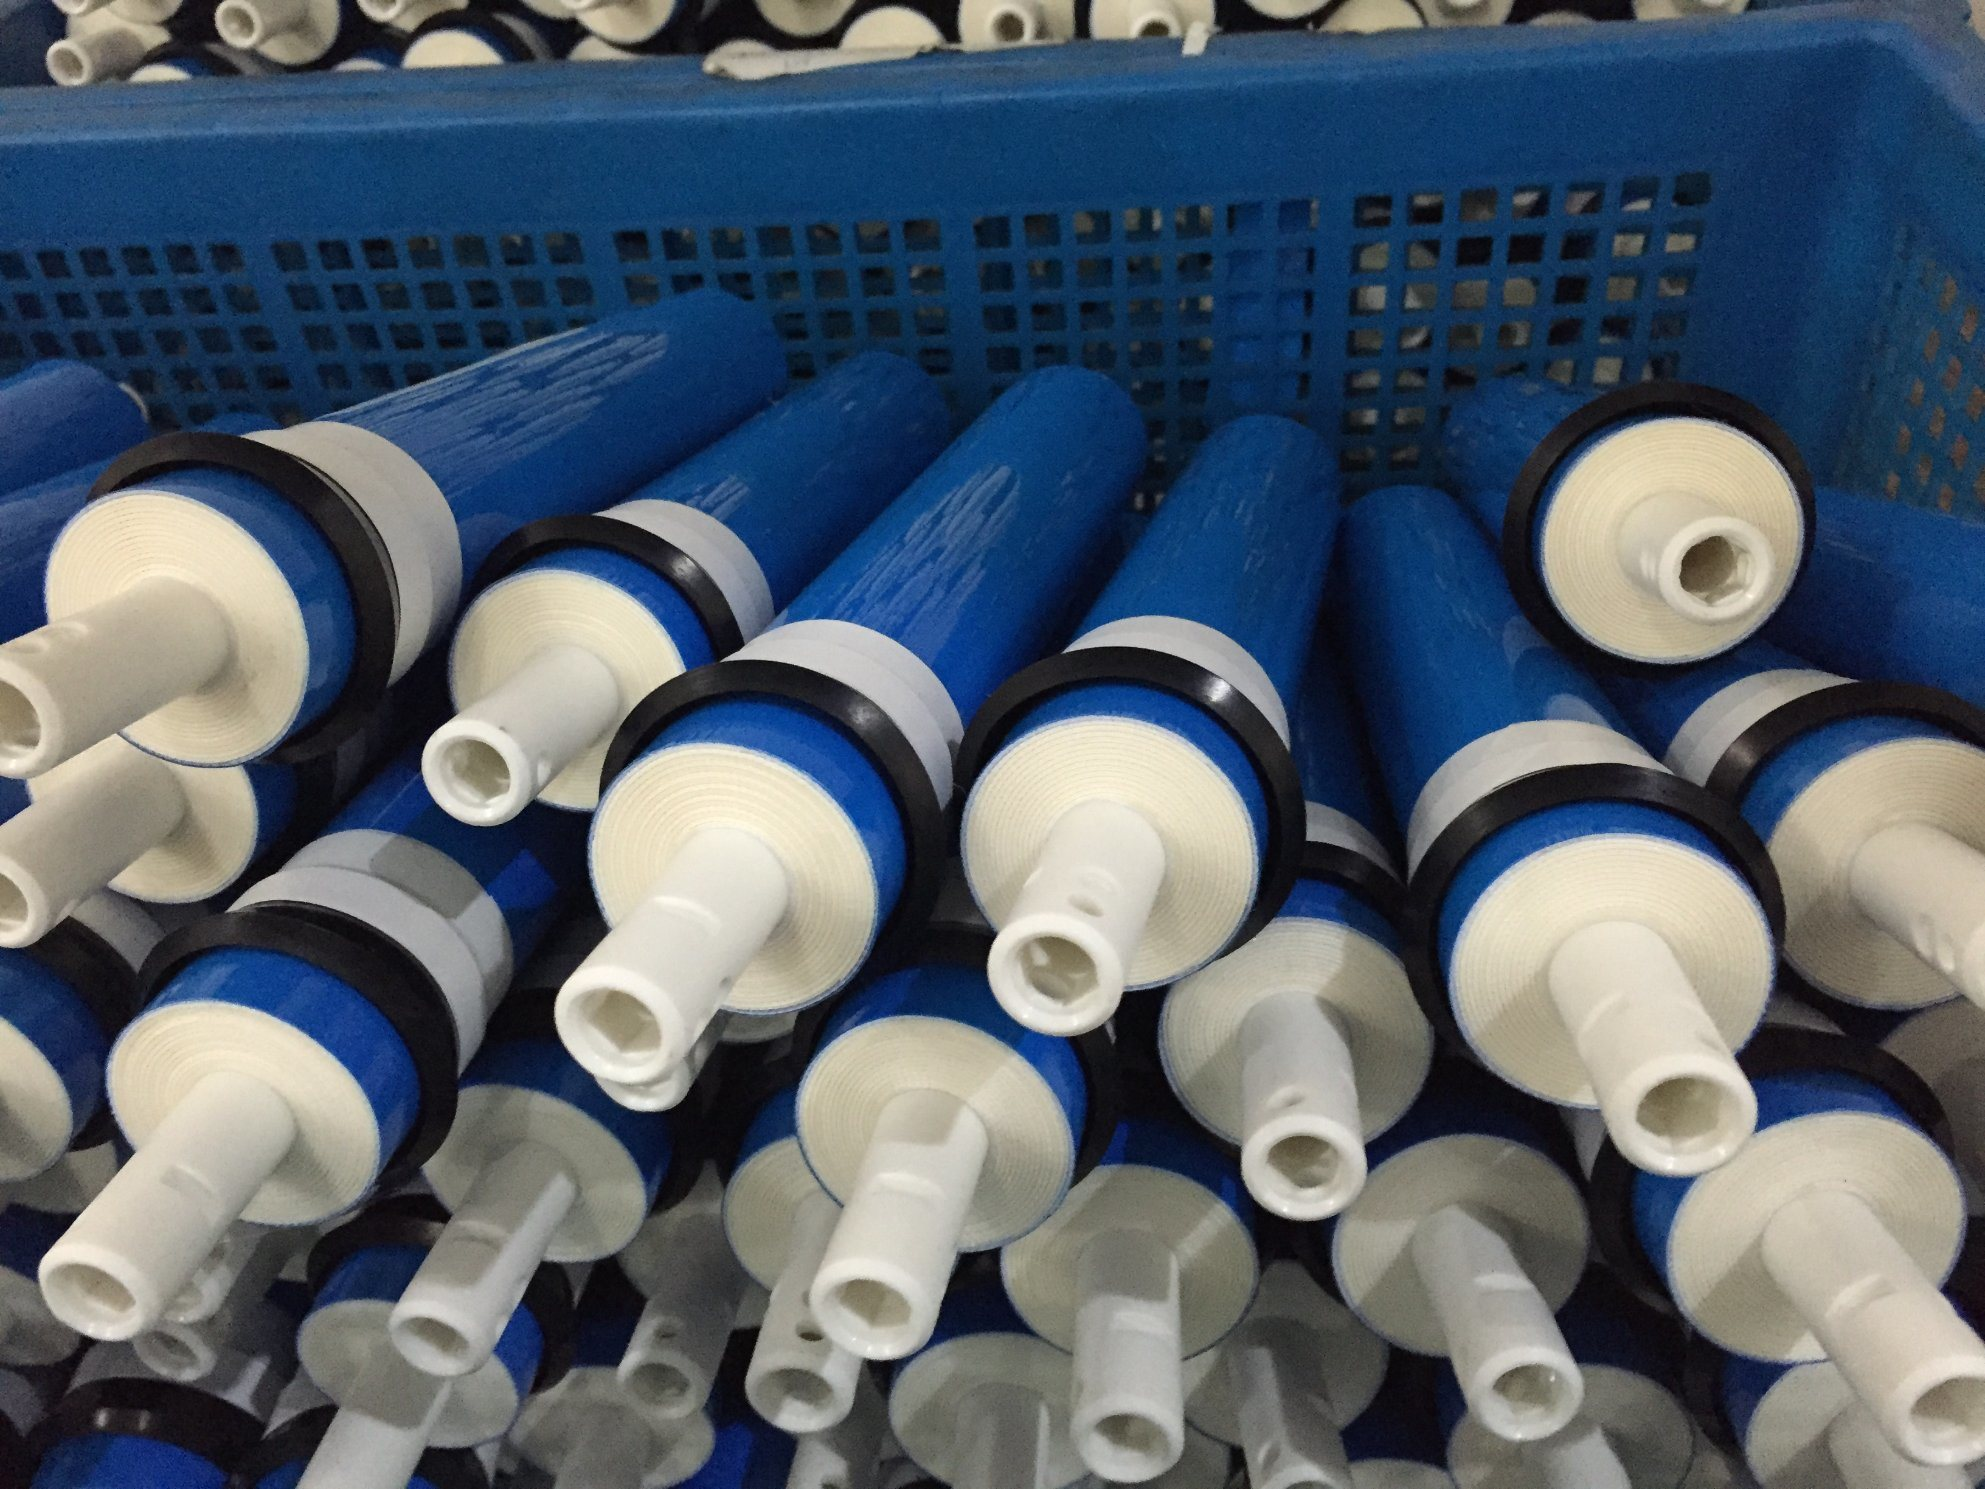 Supplier of Vontron 80 Gpd RO Membrane Element